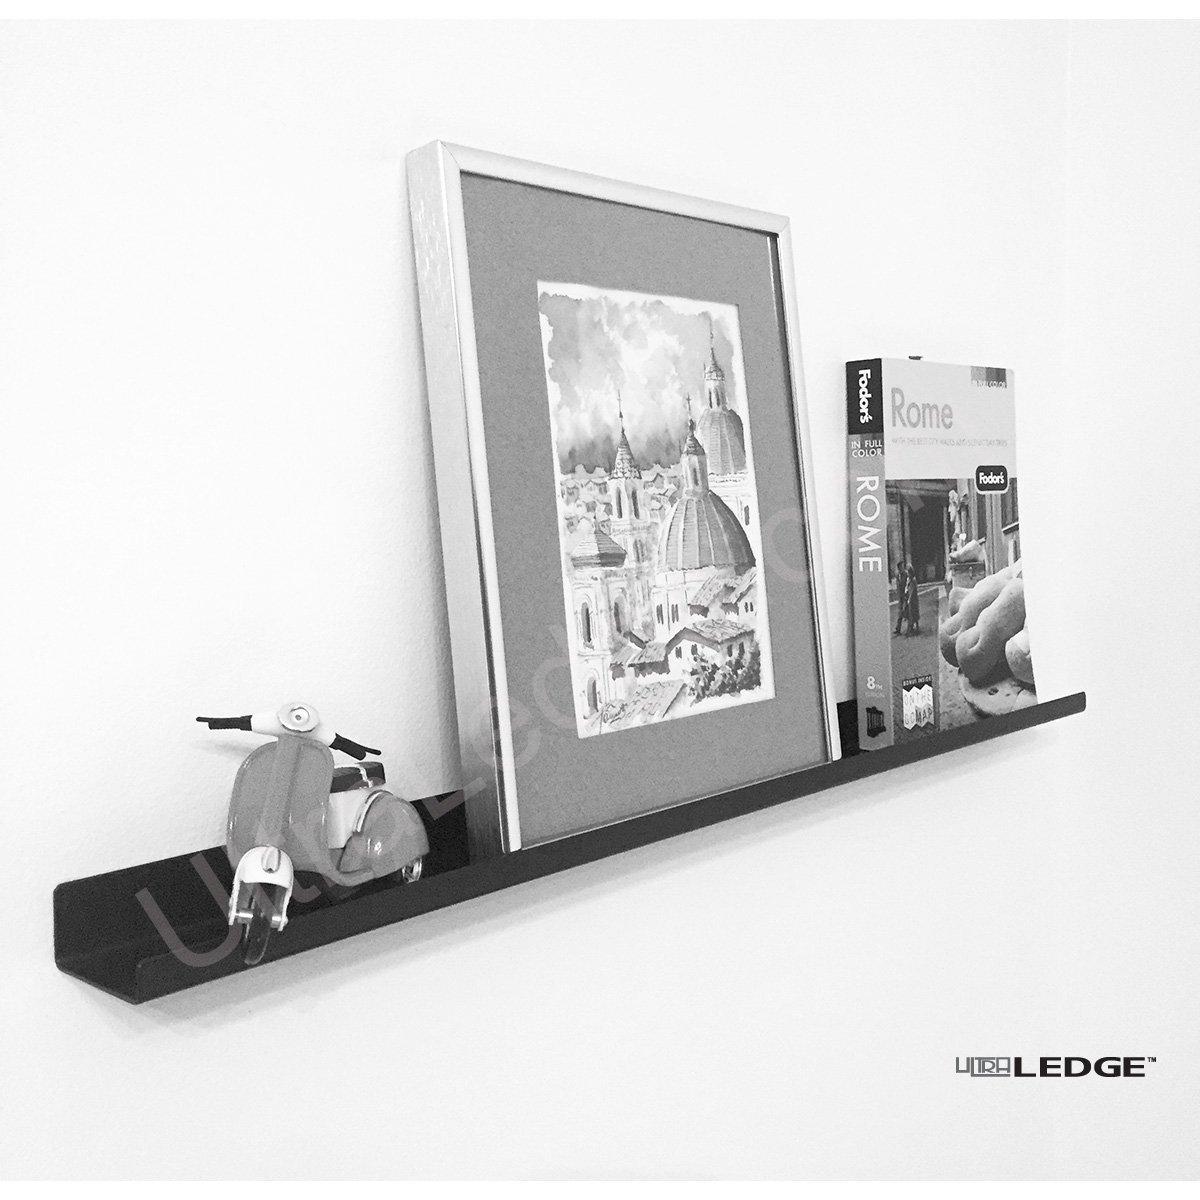 "2'/24"" UltraLedge Art Display / Picture Ledge / Floating Shelf, Metal, Modern (3.5"" deep, Black)"